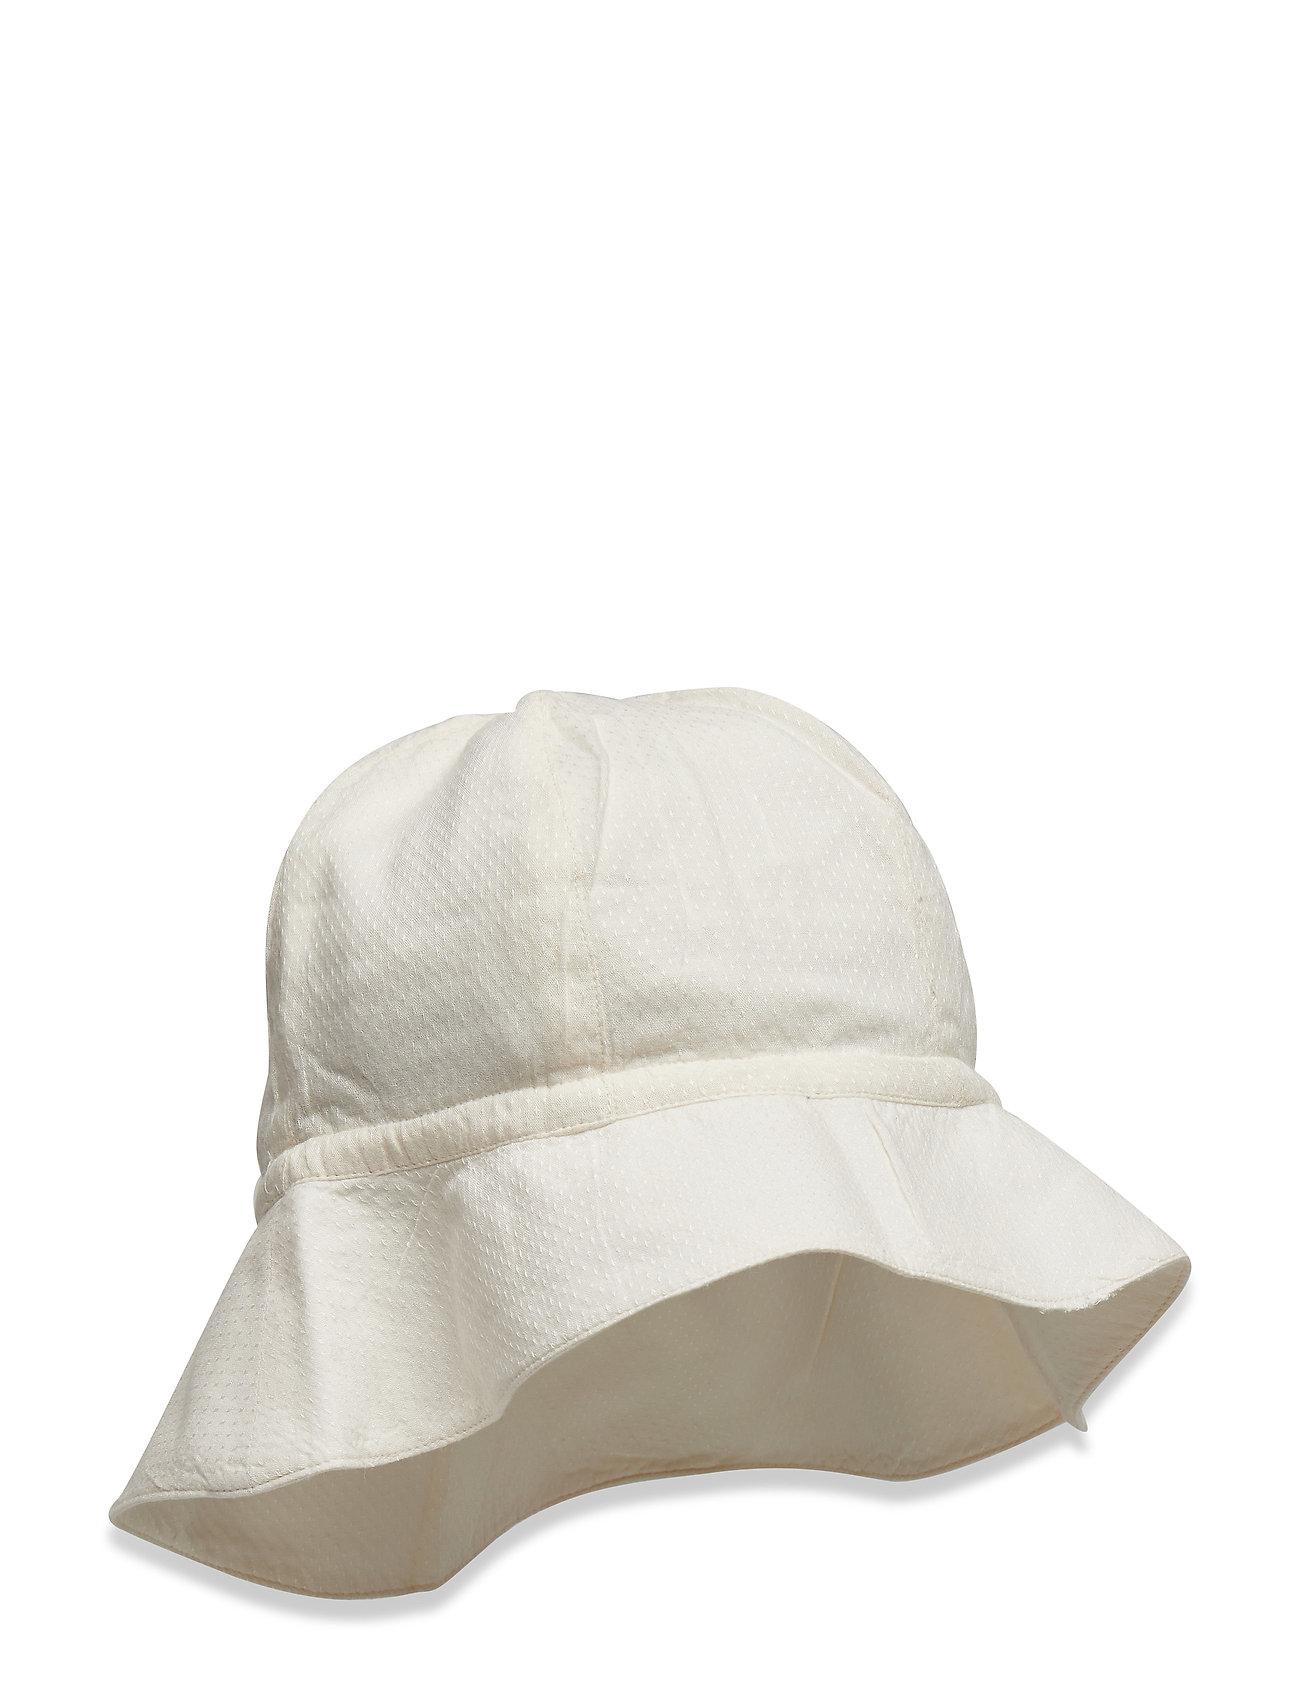 b1480d37279 Sun Hat Chloé (Ivory) (£18) - Wheat -